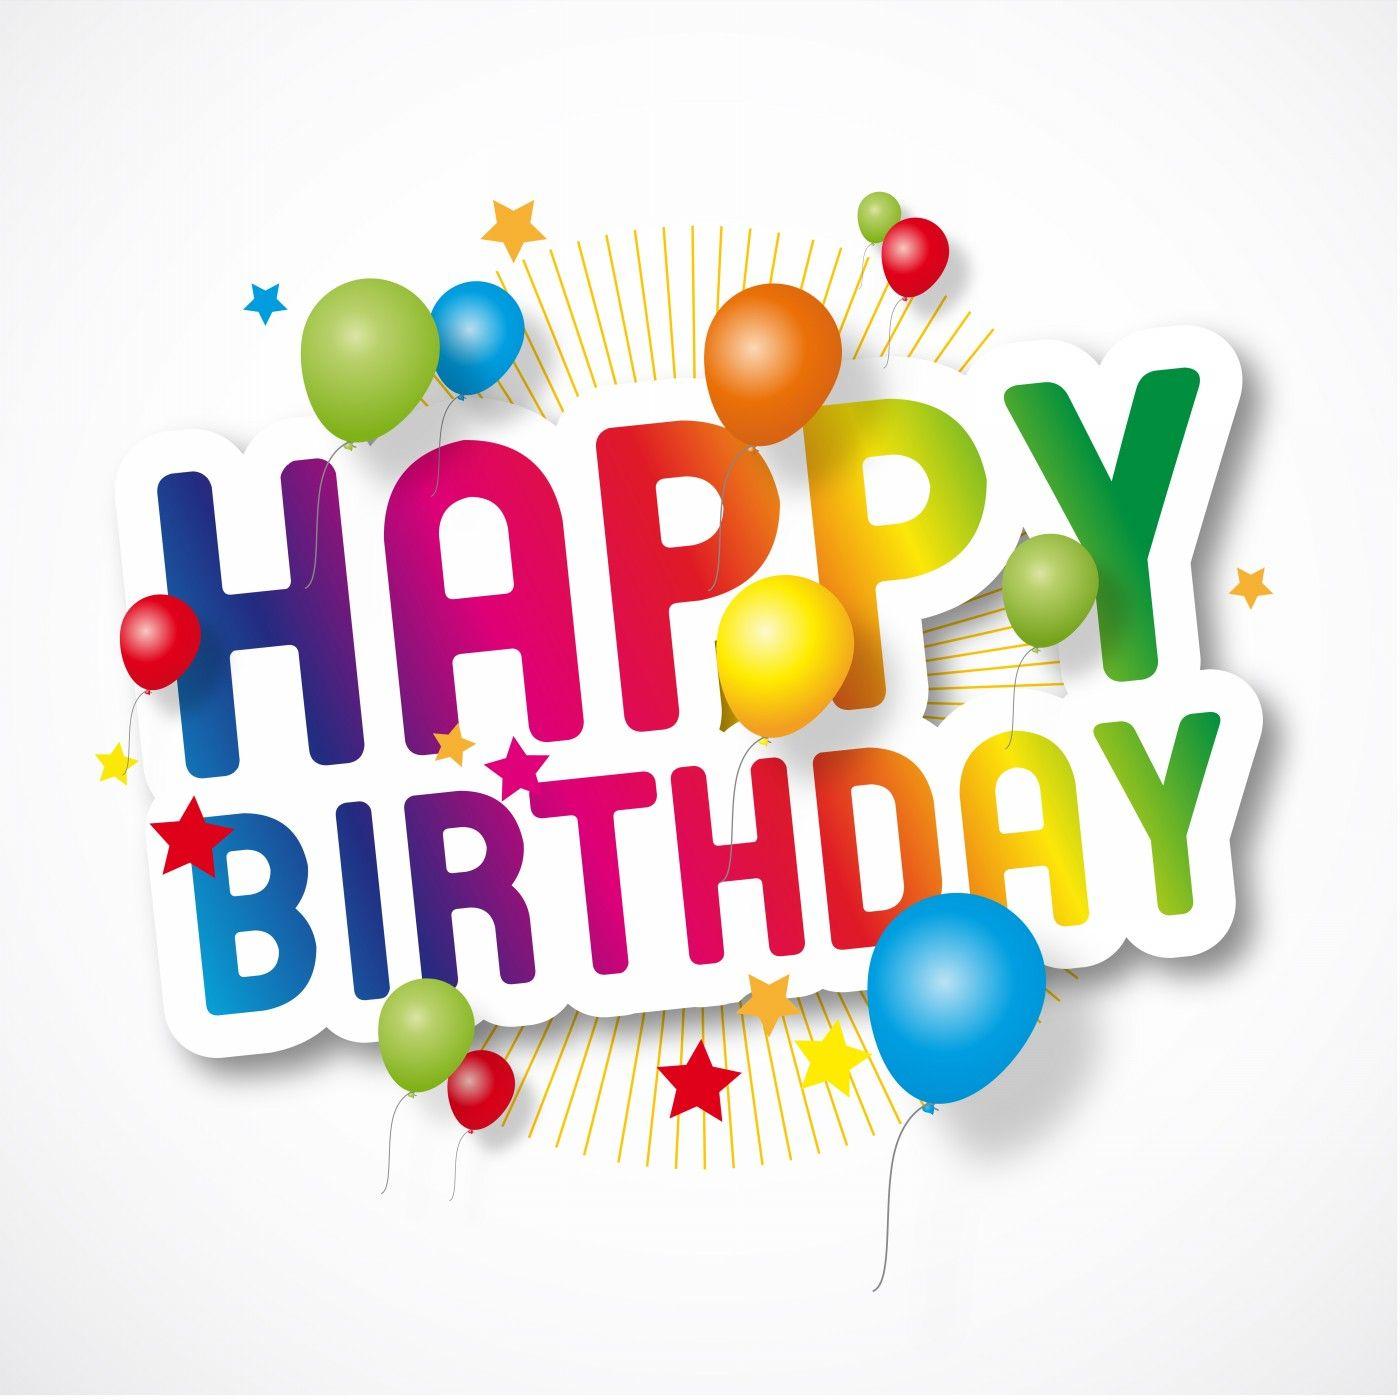 Biography W Lawrence Wild Born 1874 Birthday Wishes And Images Happy Birthday Status Happy Birthday Hd